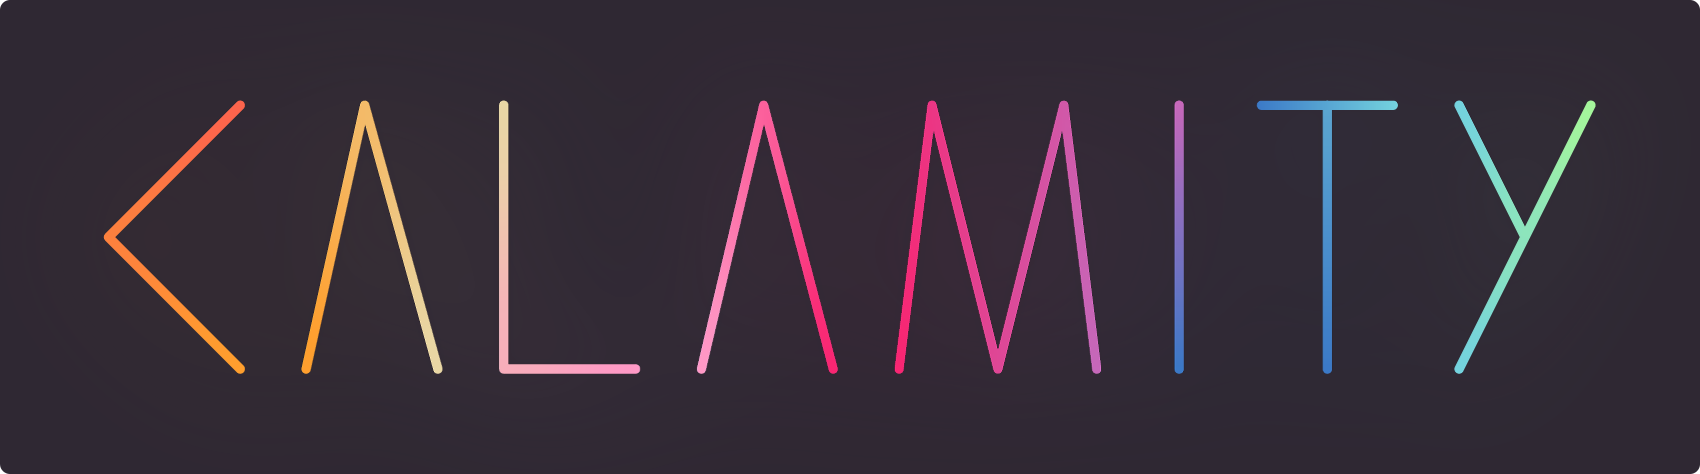 calamity-logotype